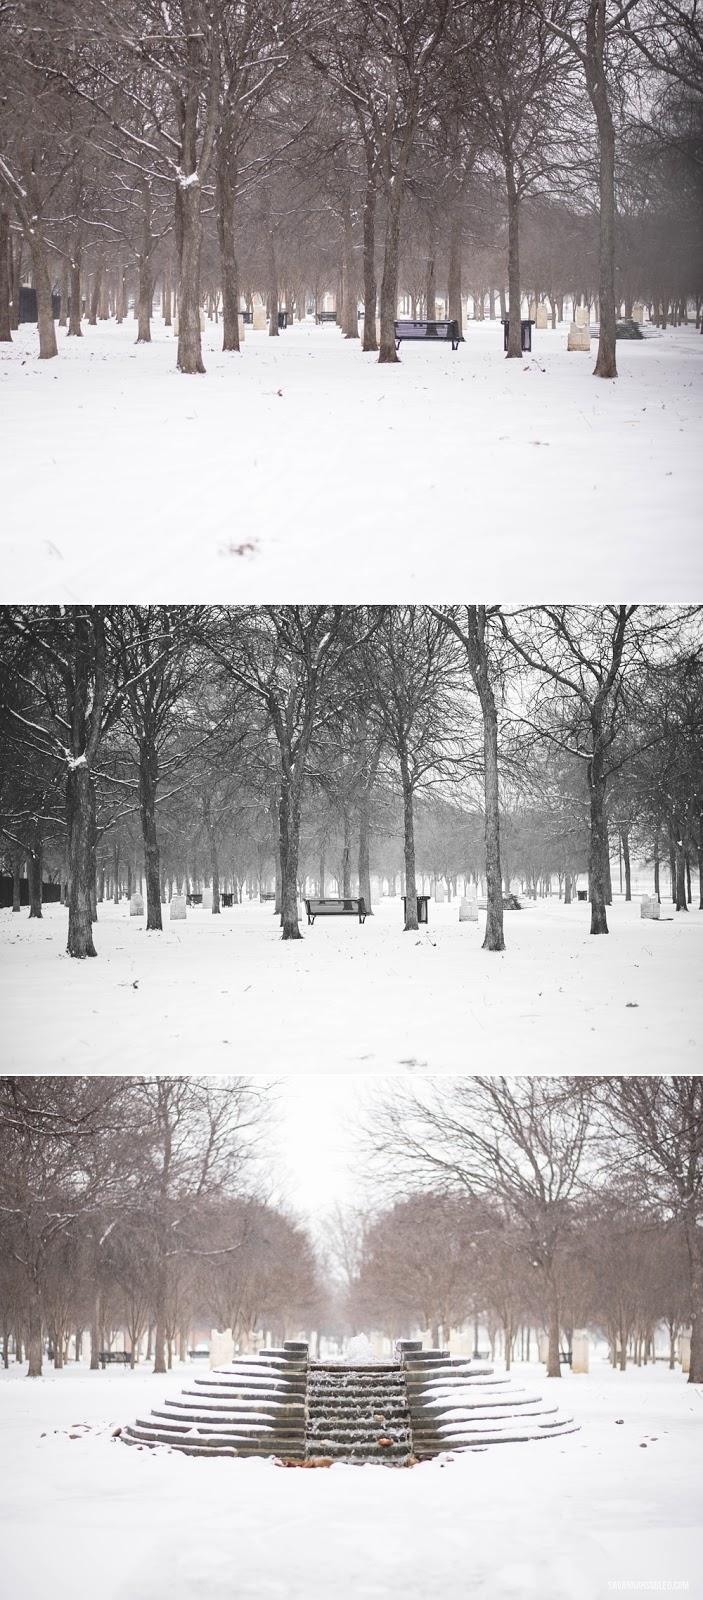 snow-day-dallas-weather-11.jpg